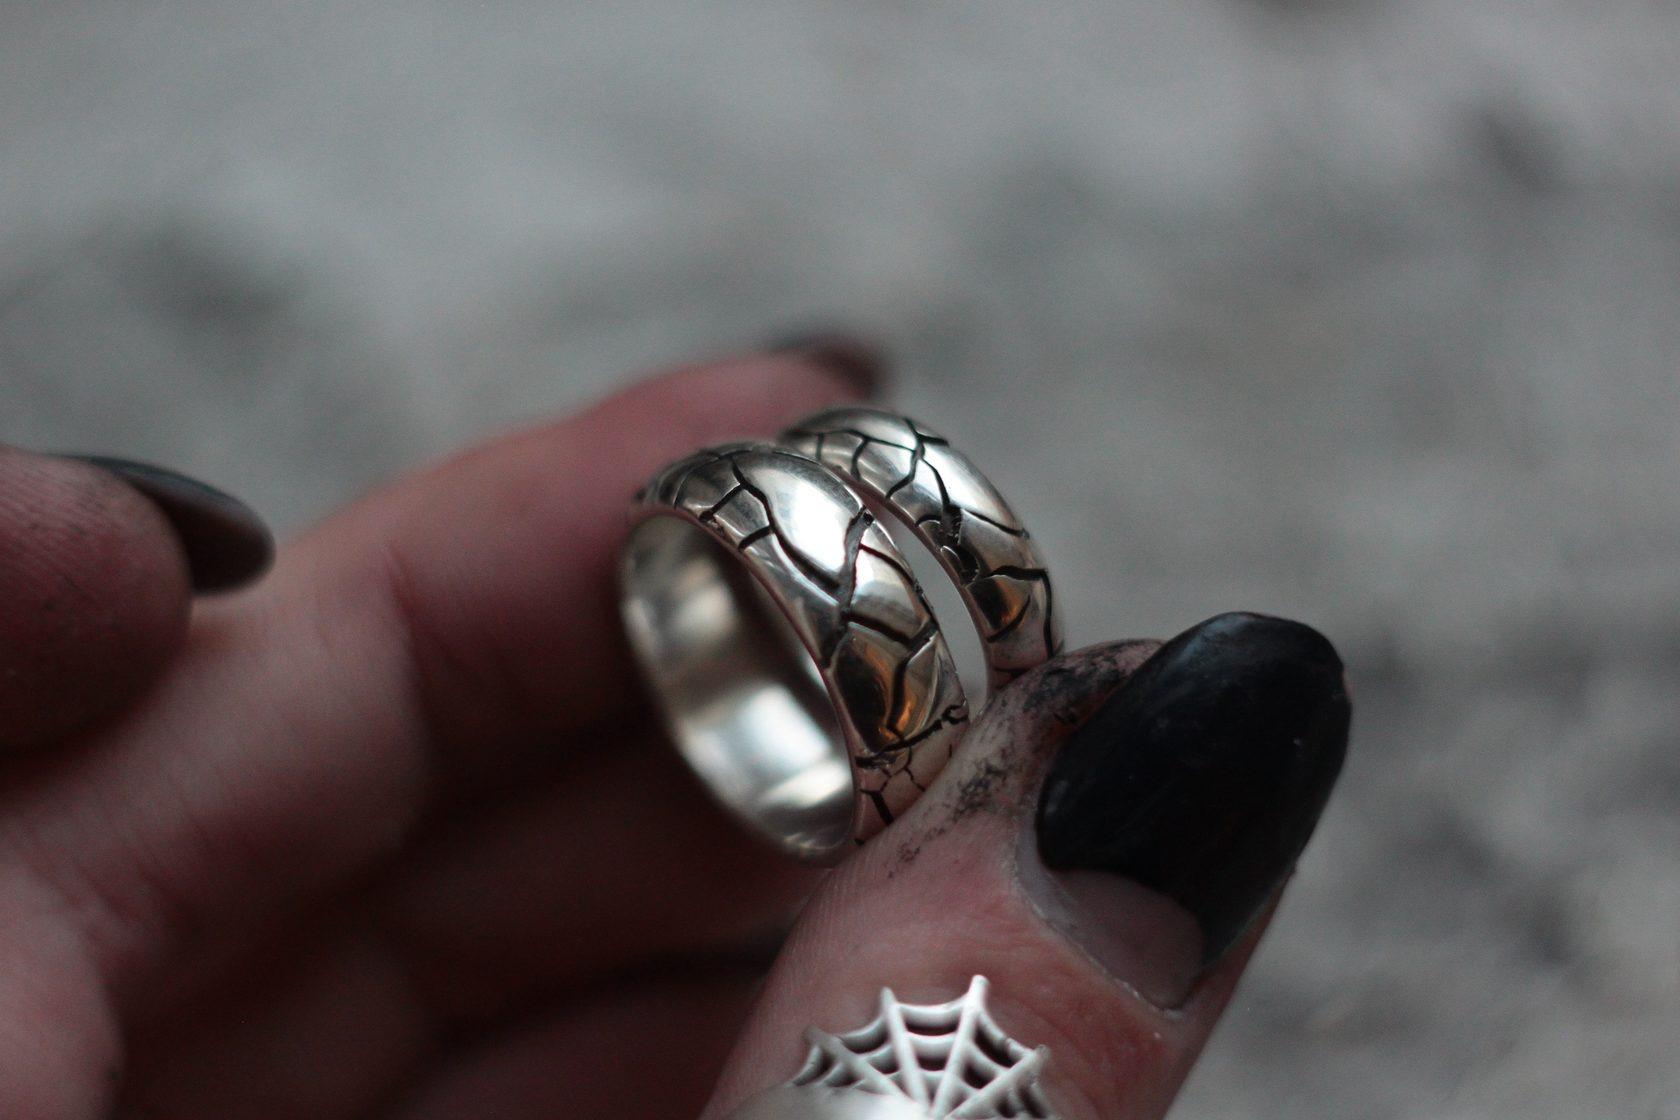 милая, как кольцо давида фото руки